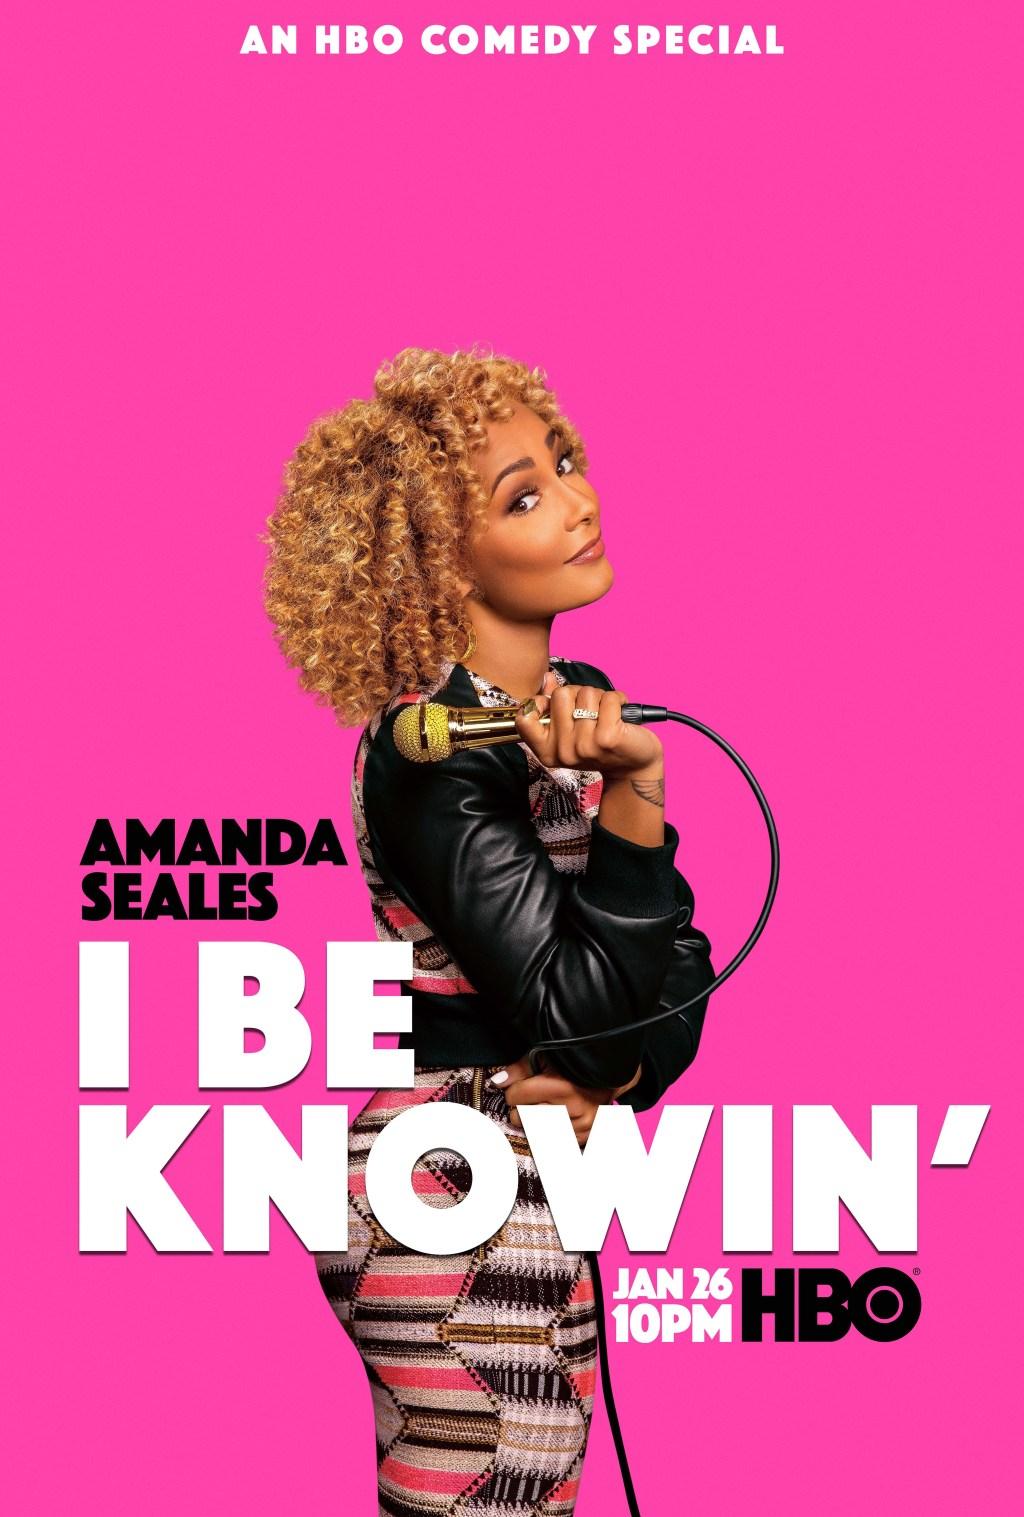 Amanda-Seales-I-BE-KNOWIN-Key-Art